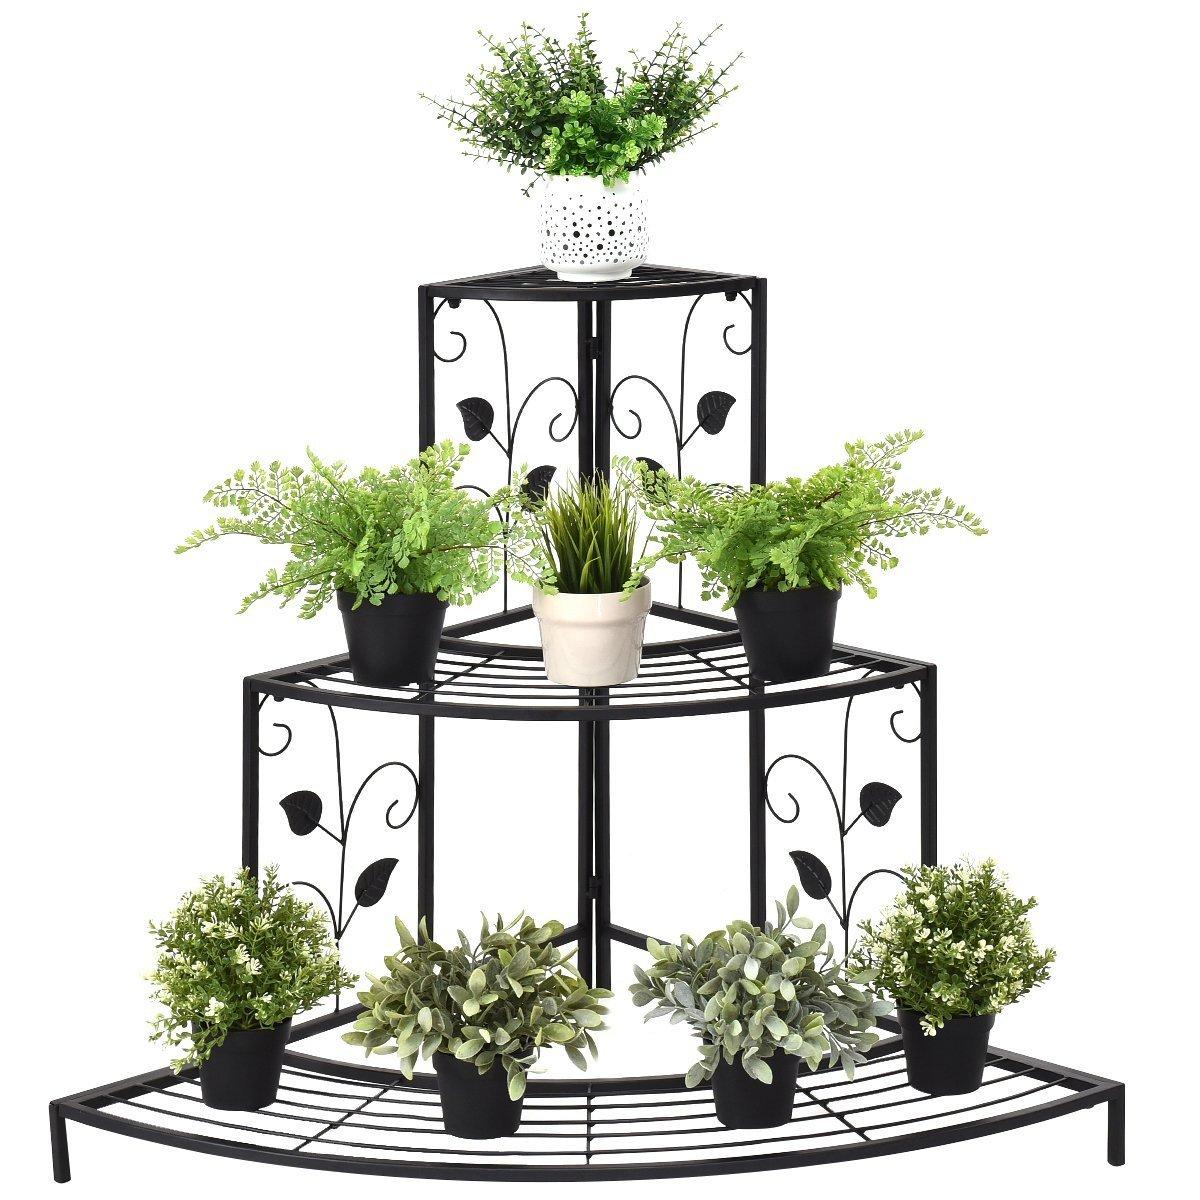 Giantex 3 Tier Plant Stand Floral Corner Metal Flower Pot Rack Stair-Step Style Display Ladder